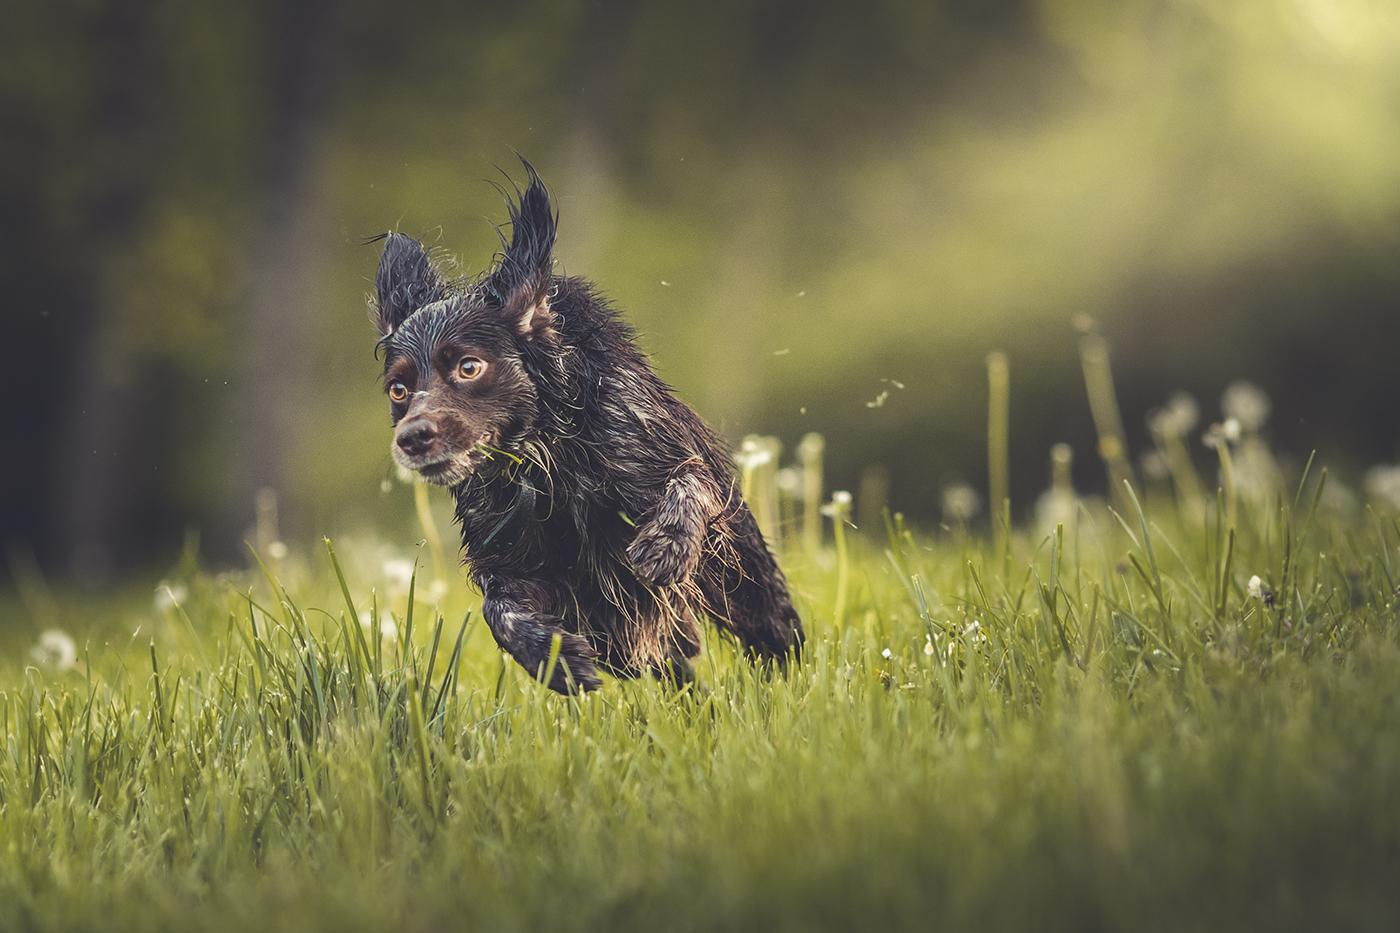 photographe-animalier-chien-canin-poitiers-guillaume-heraud-17